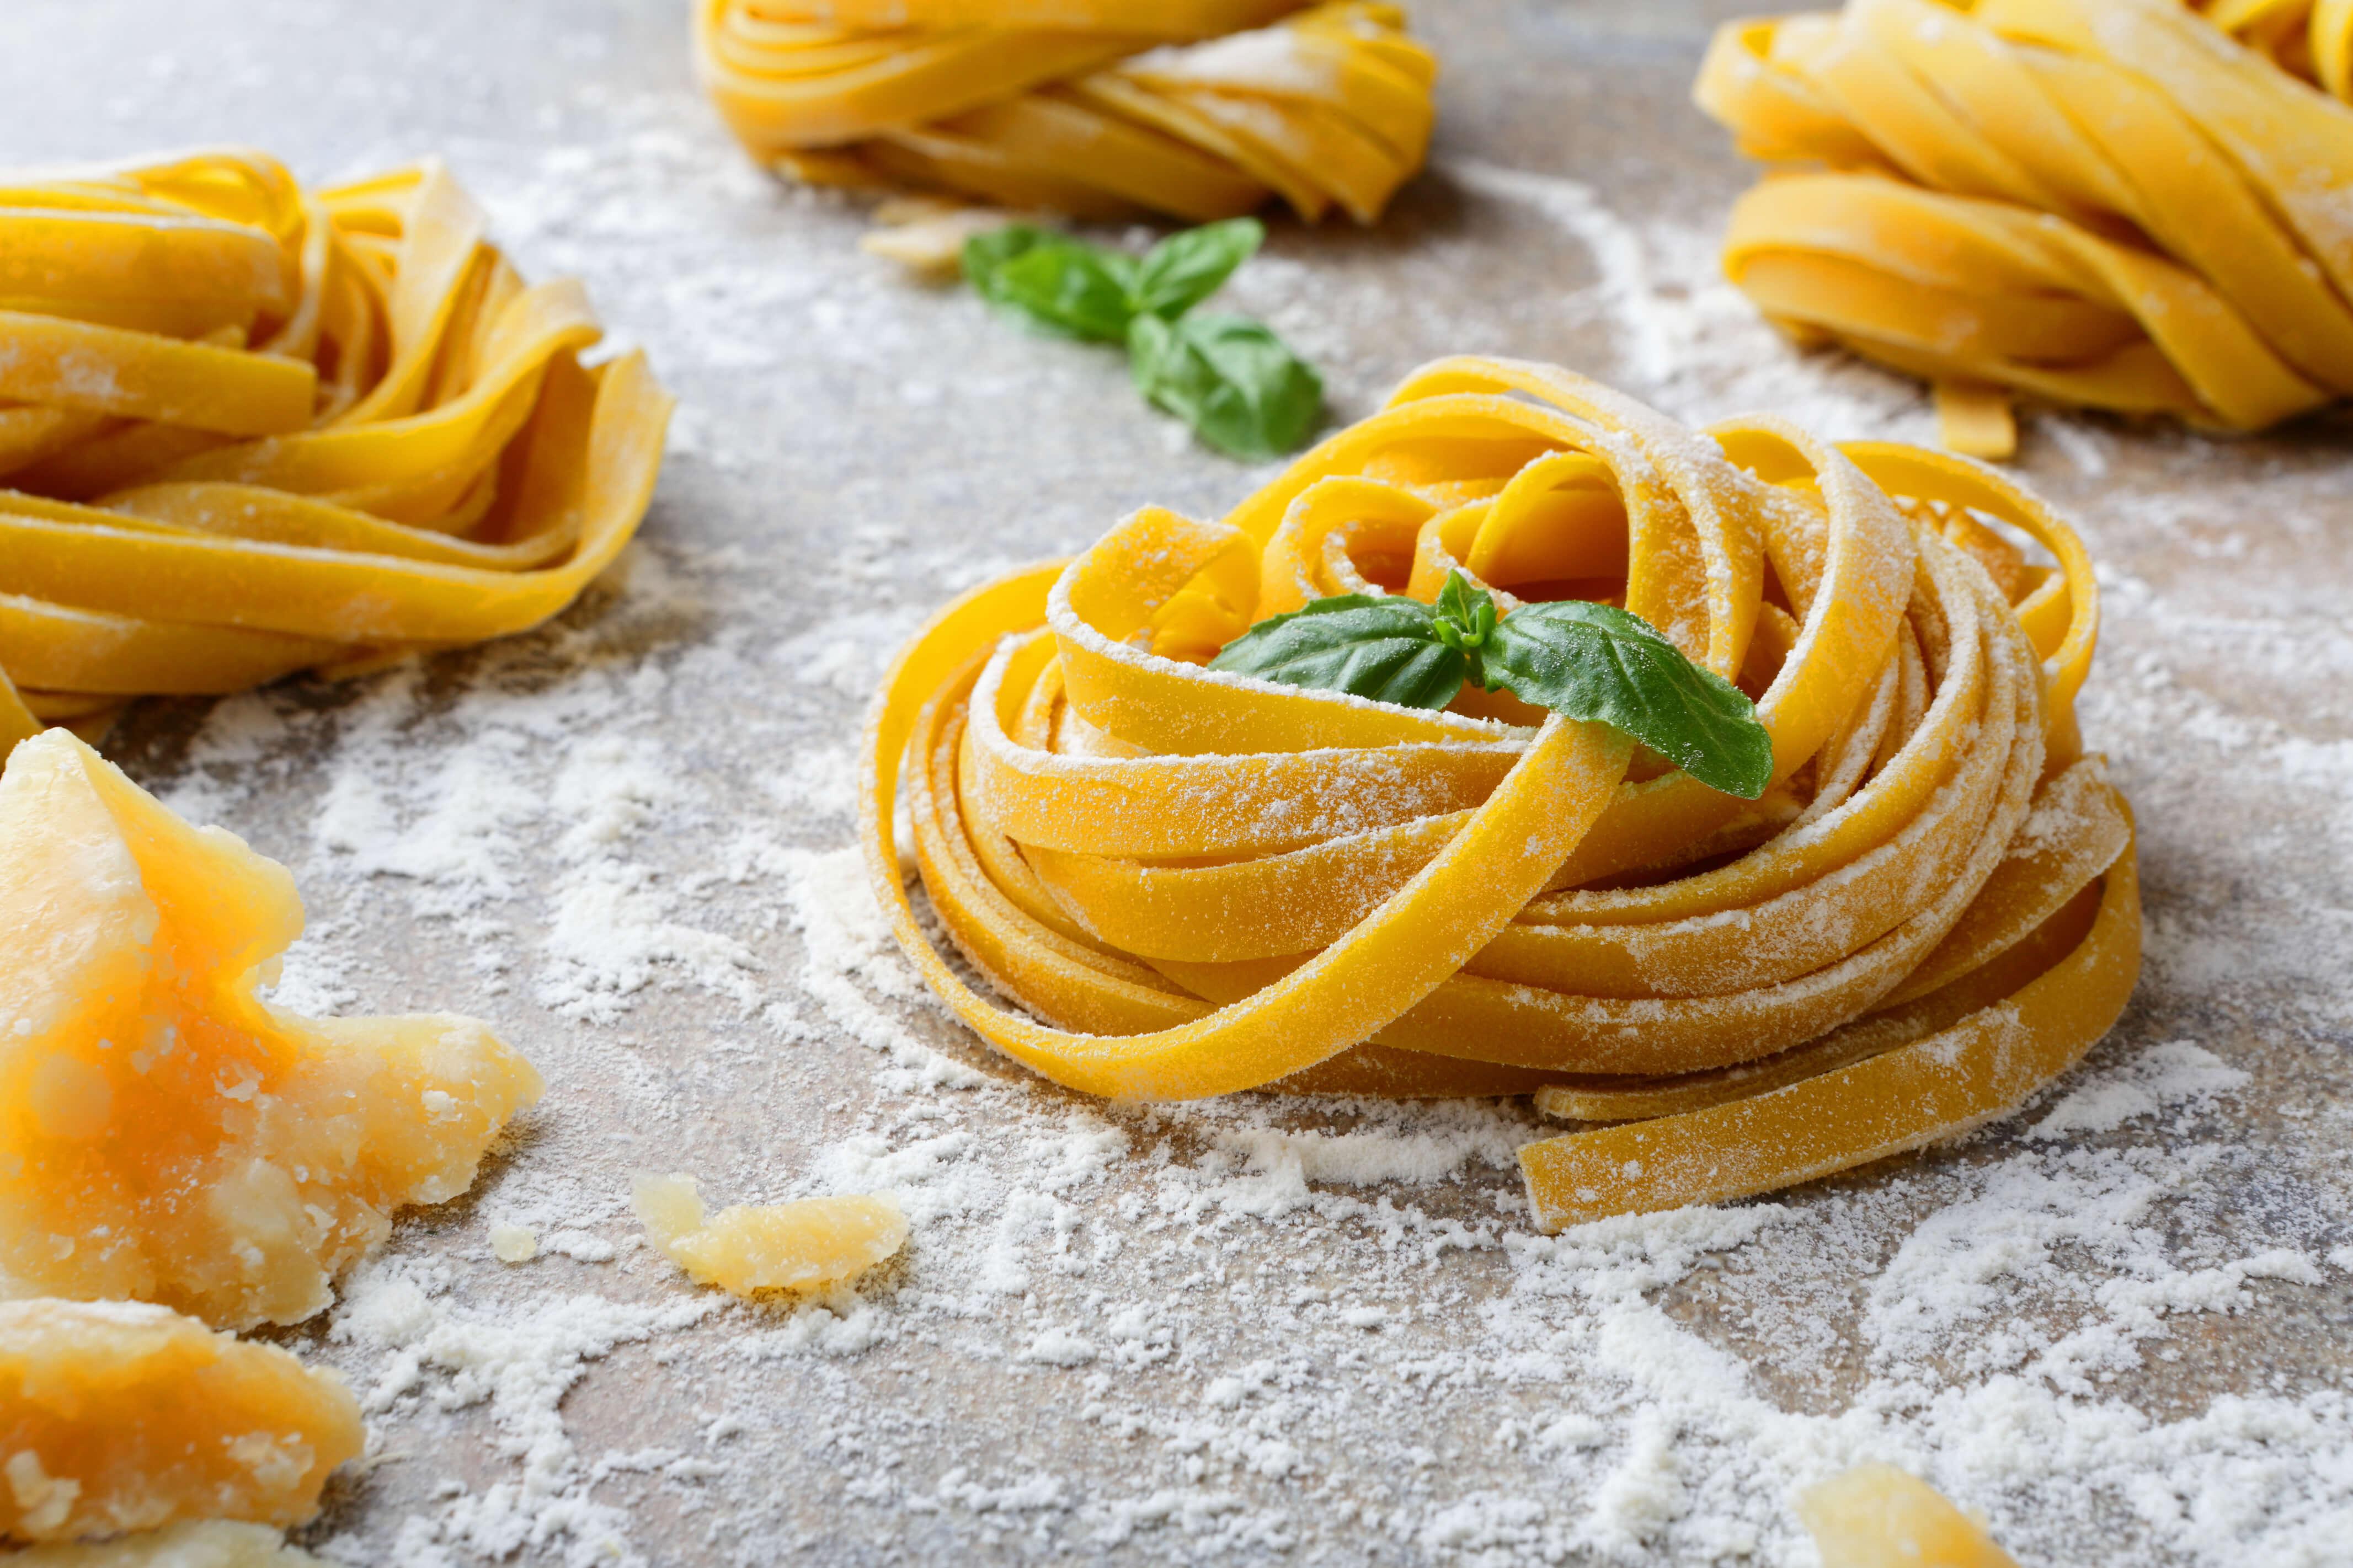 recette-tagliatelle-au-saumon-cuisson-tagliatelles-fraîches-idée-recette-tagliatelles-fraîches